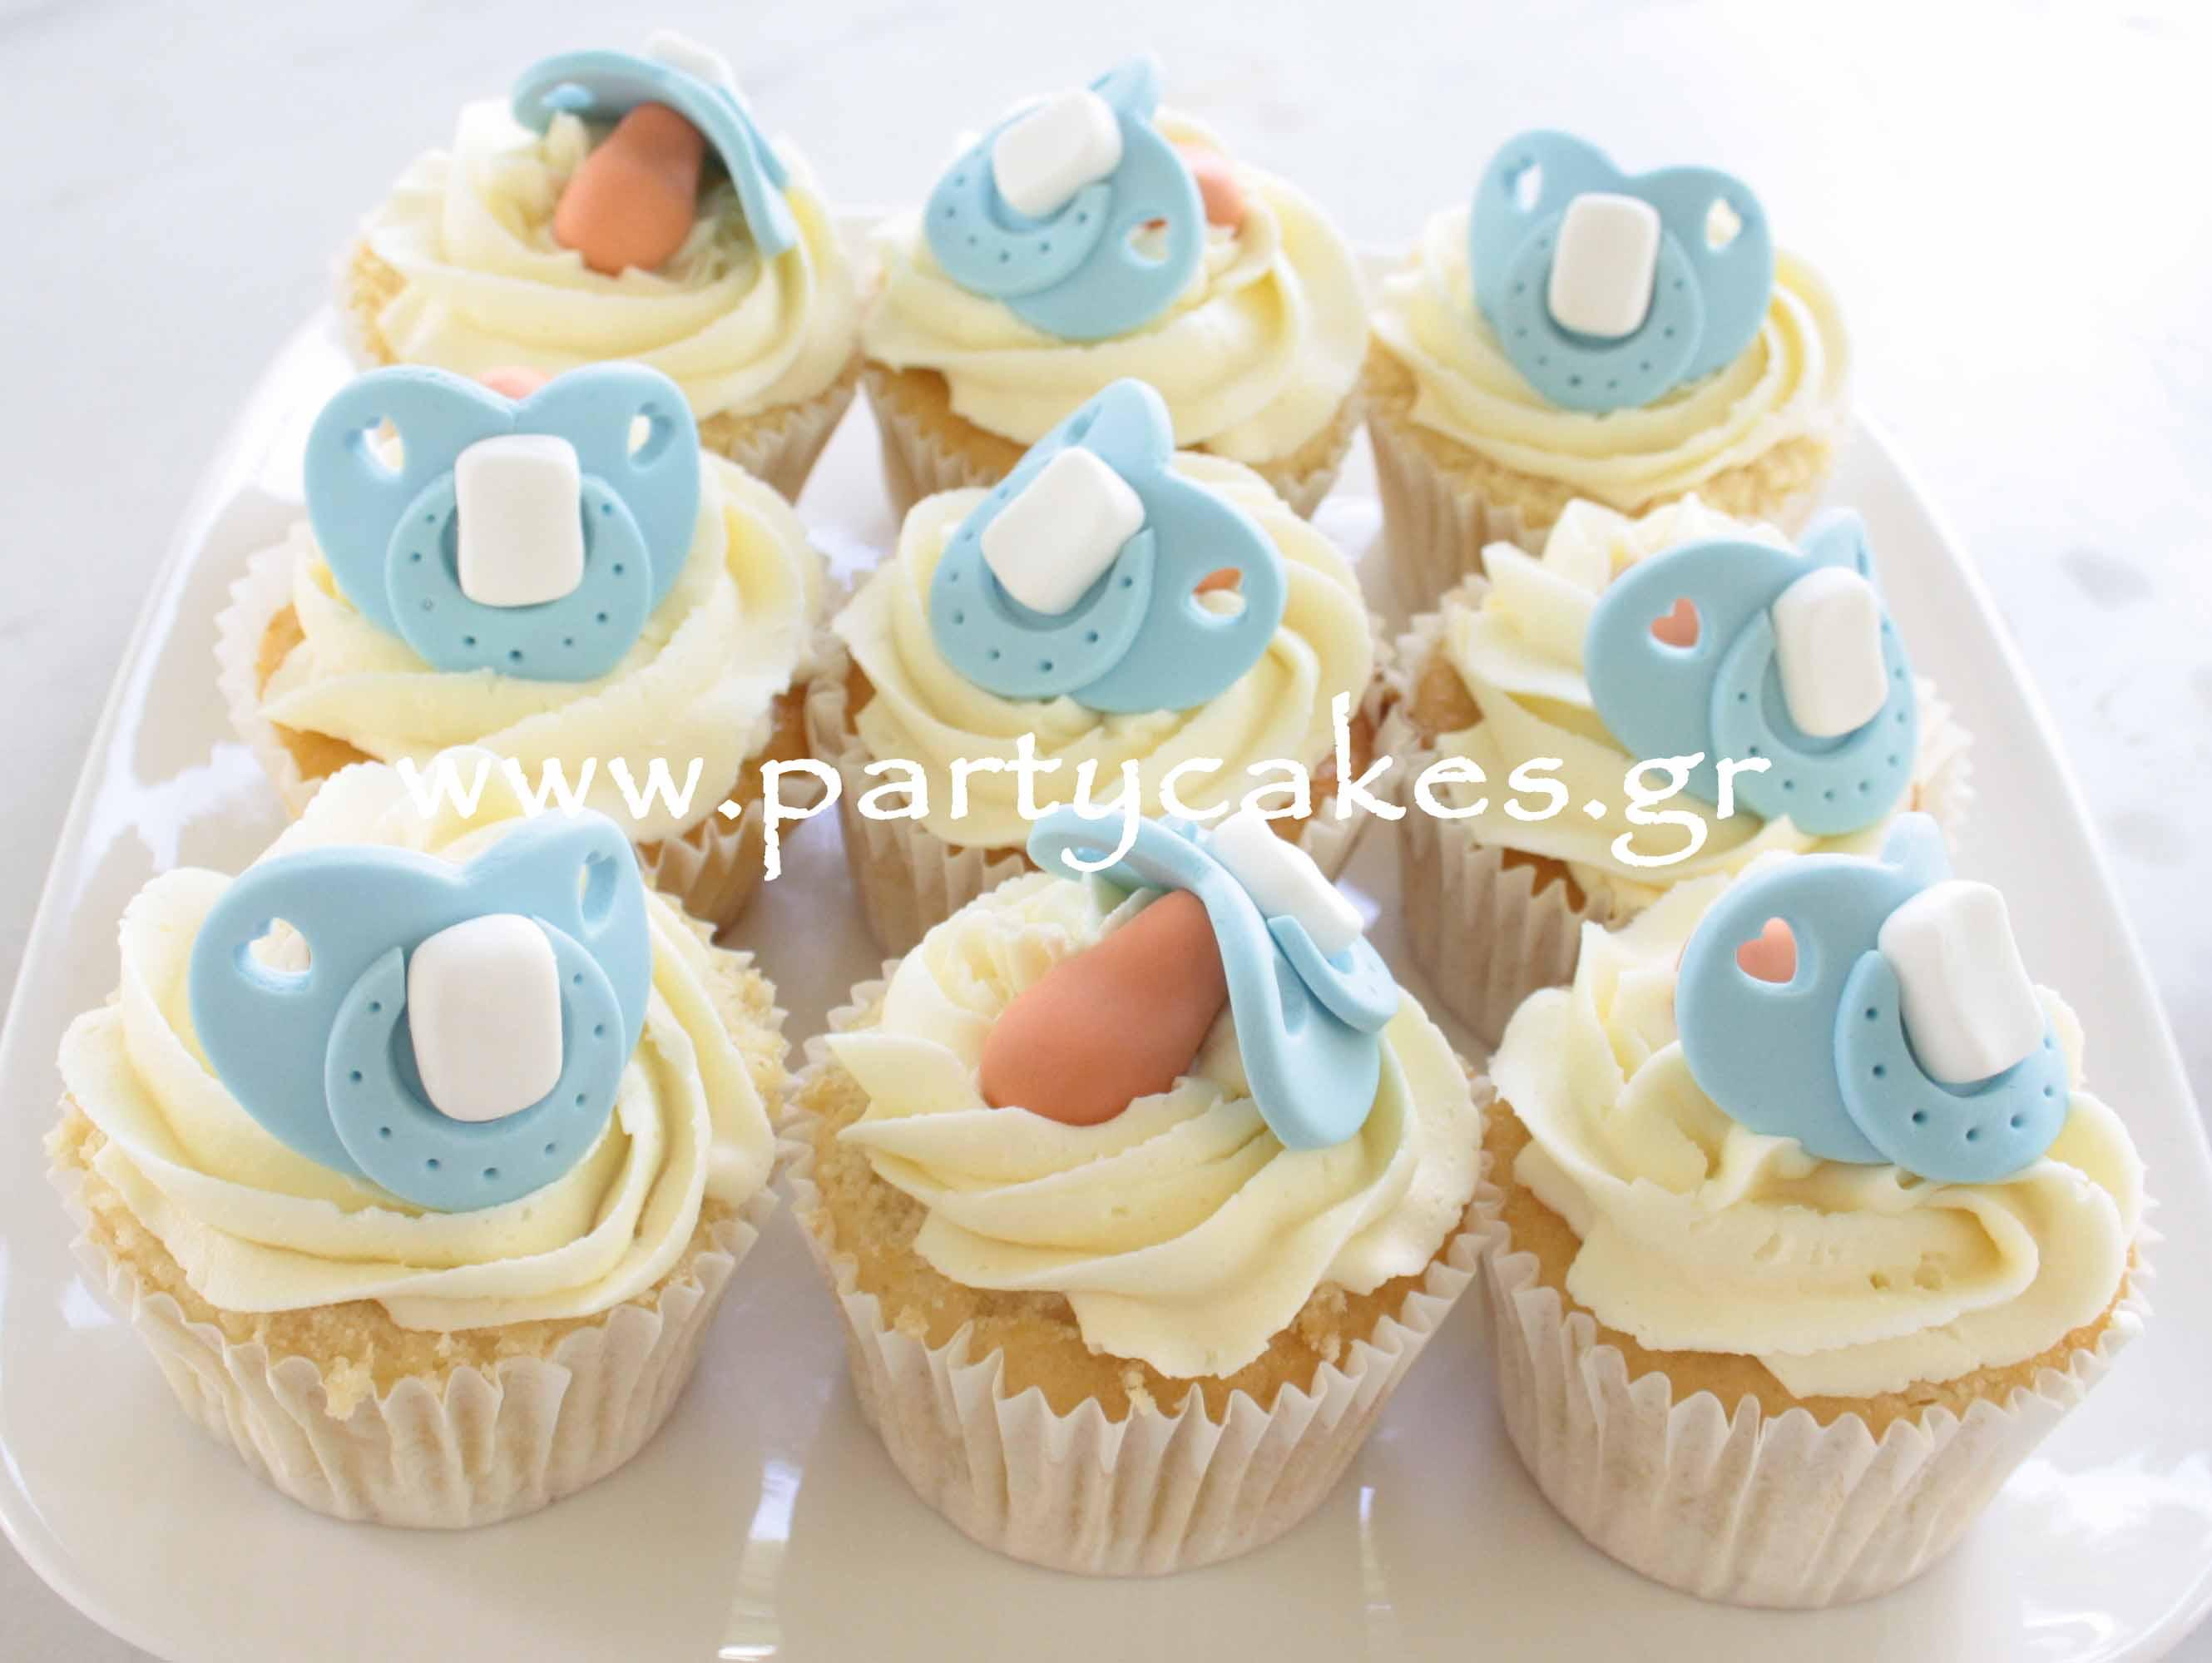 Dummy cupcakes 1.jpg